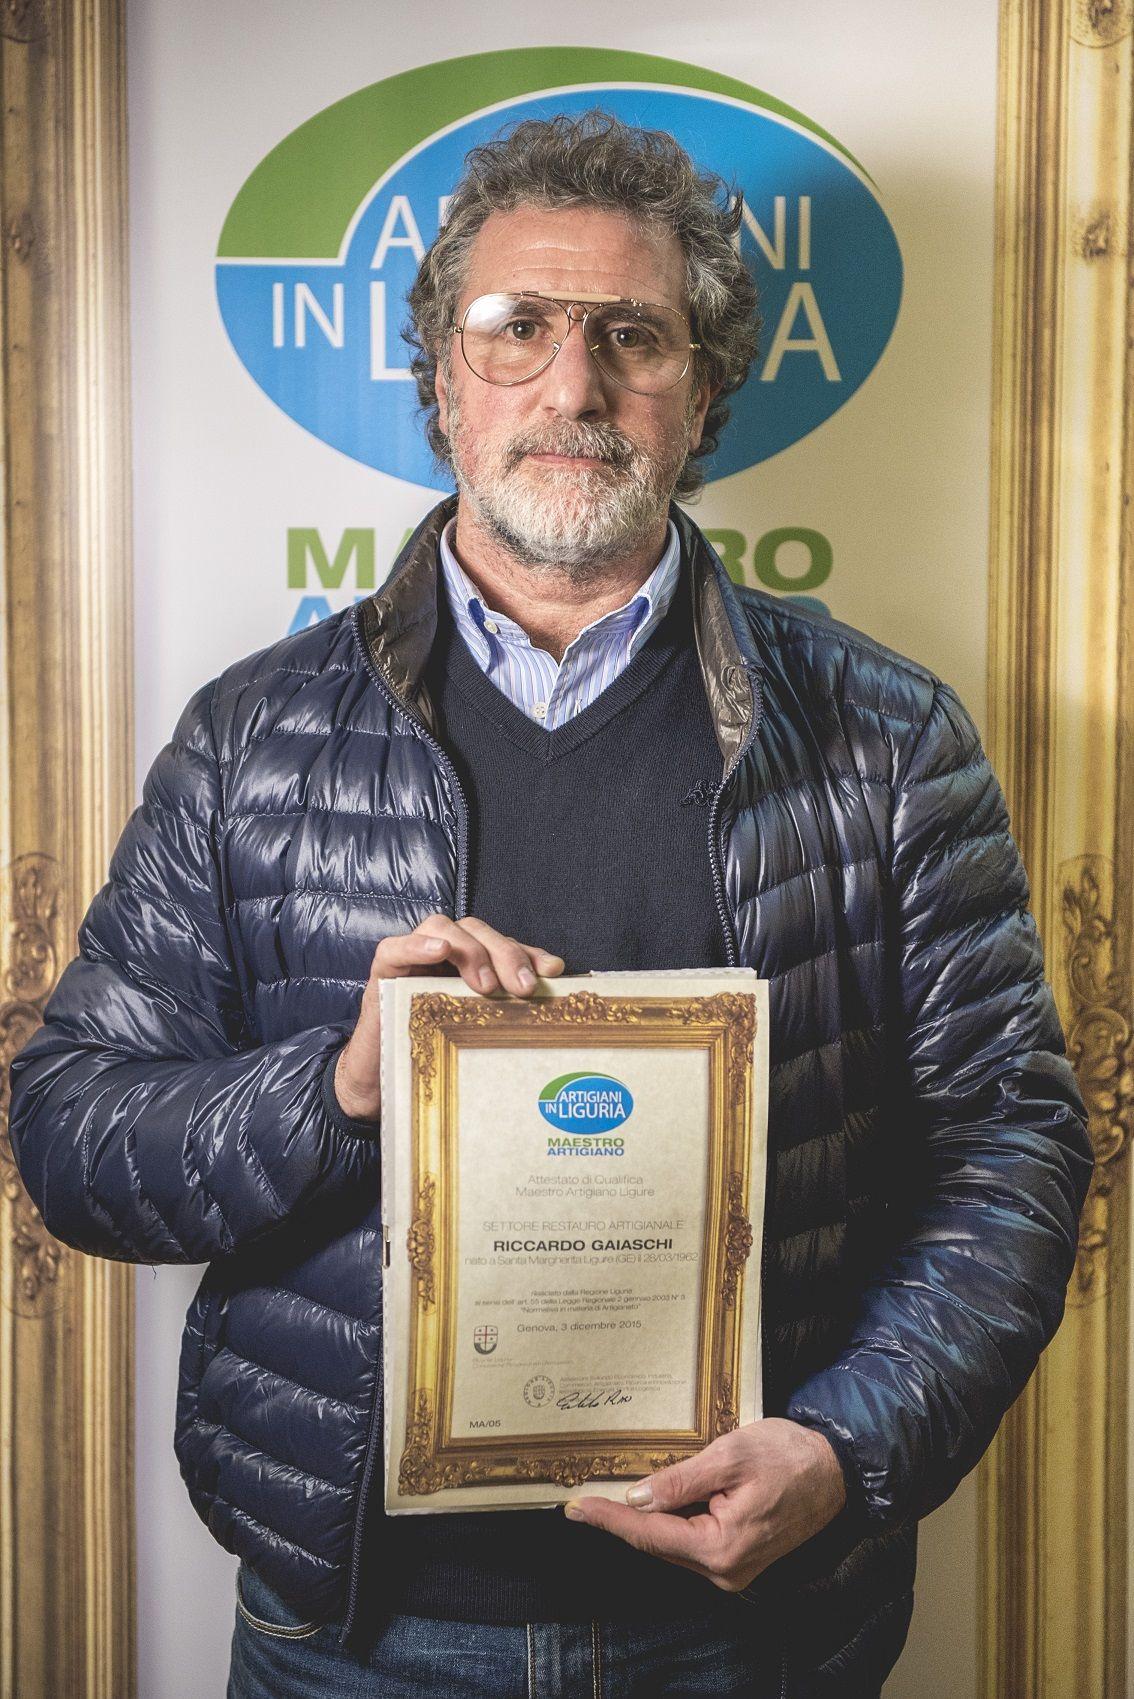 Riccardo Gaiaschi Maestro Artigiano Del Restauro Artigianale Ph